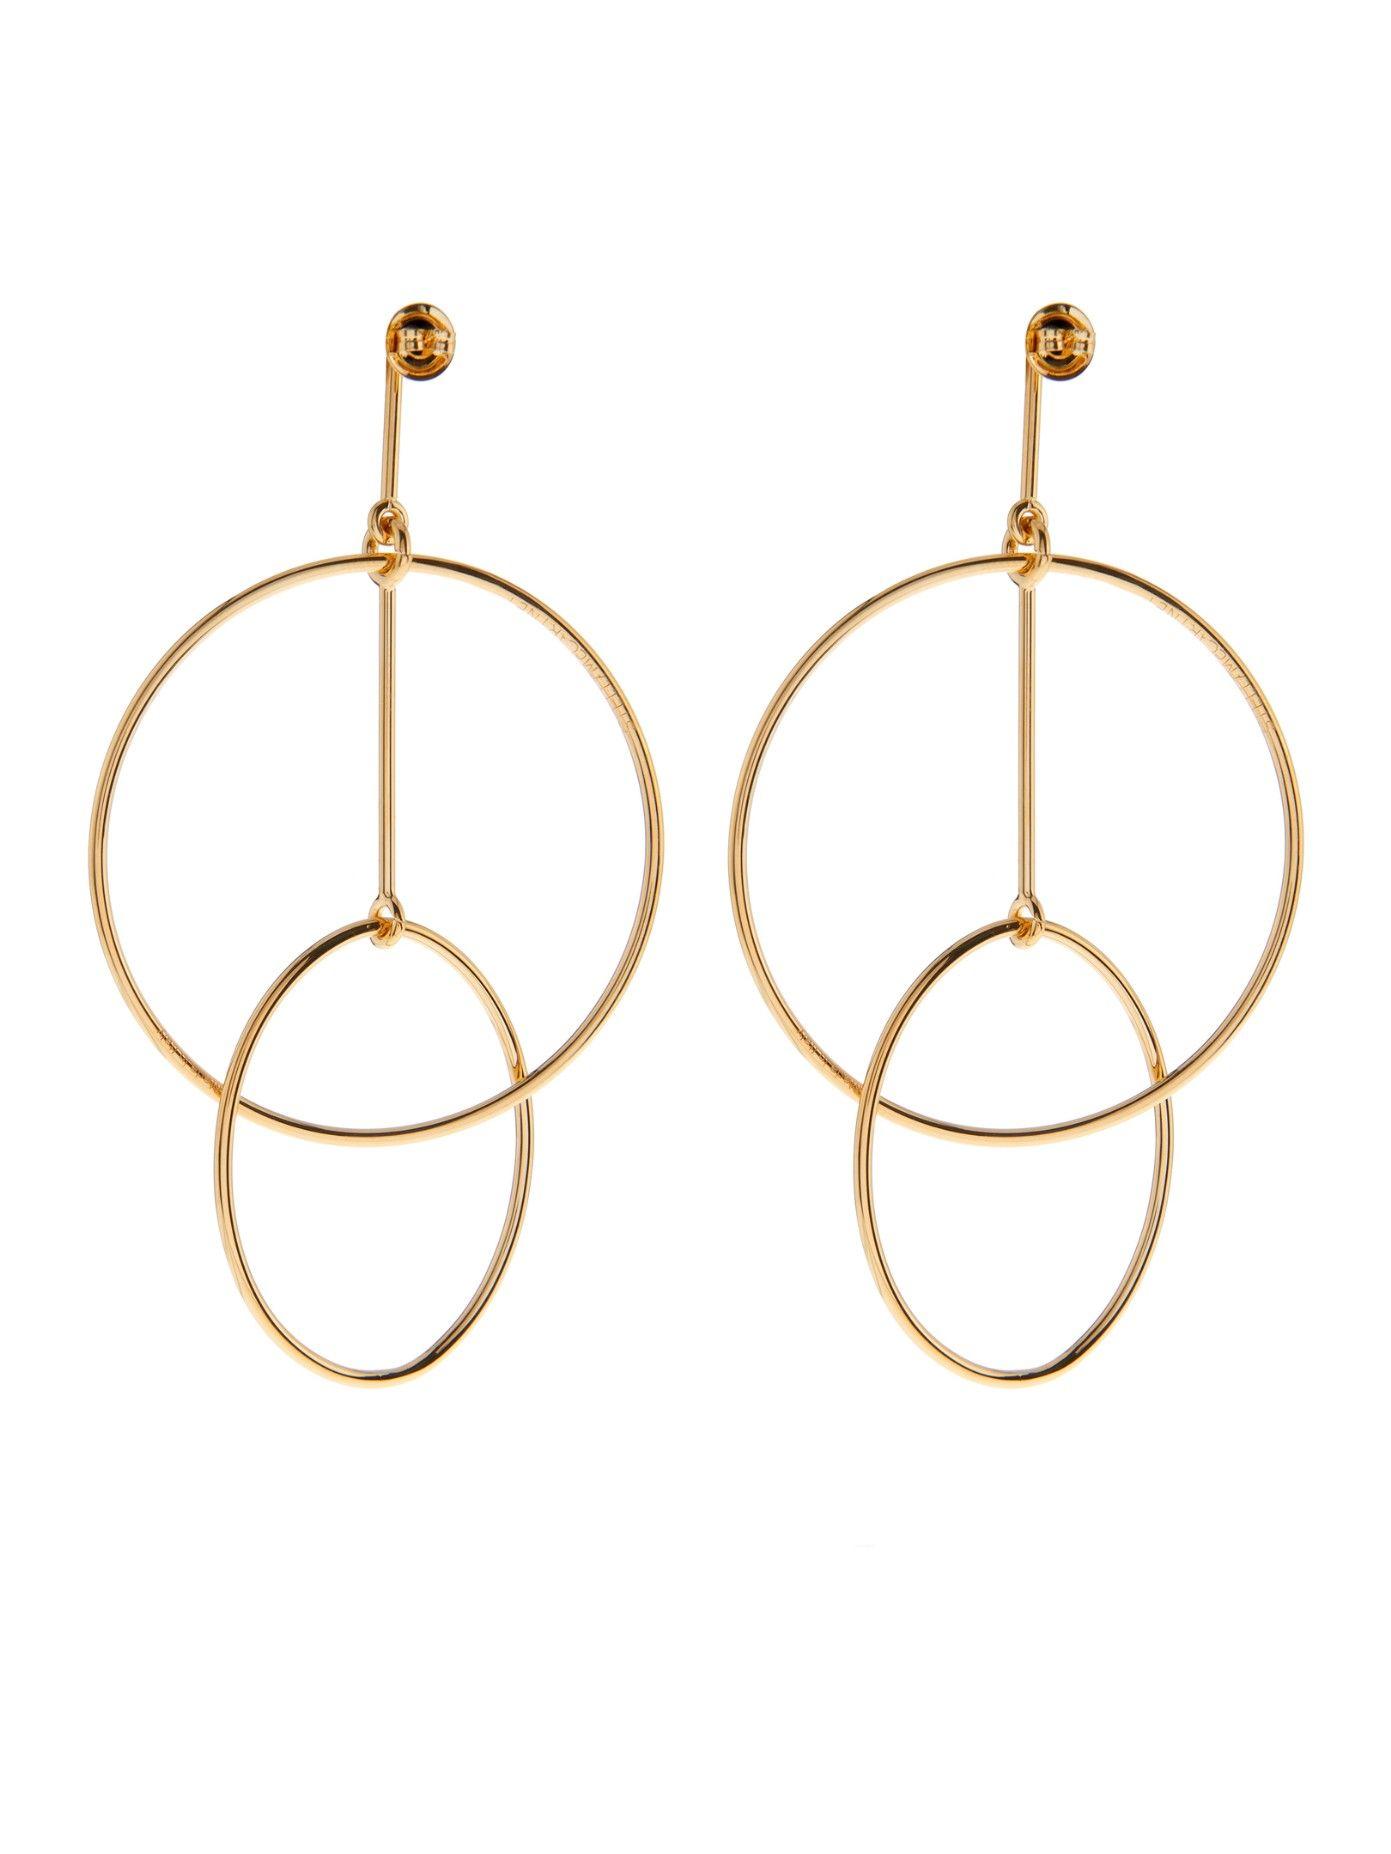 Cheap Gemstone Jewelry Online